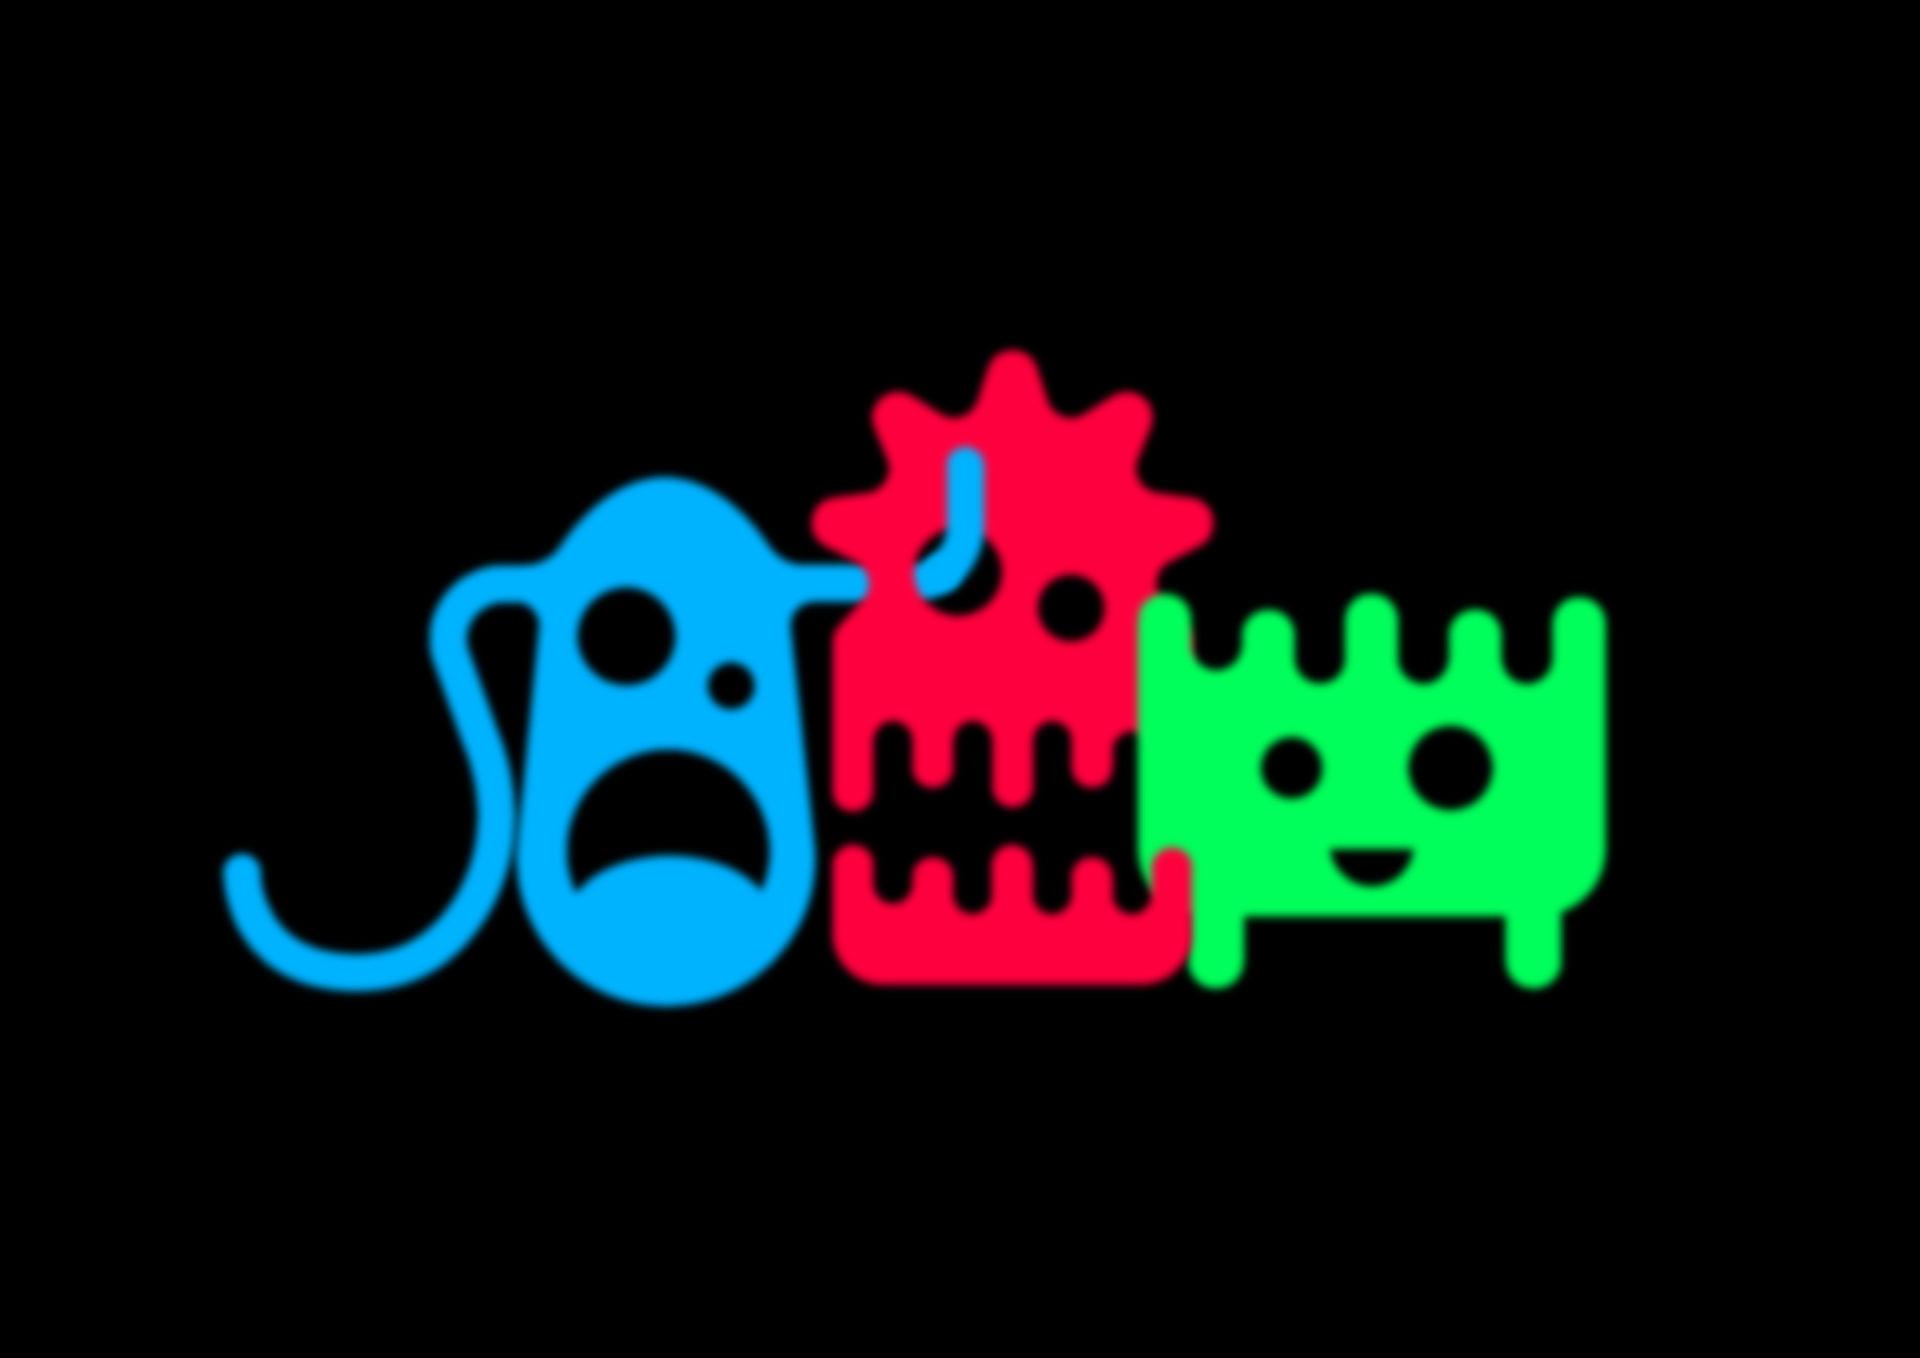 Hutt City Council - Identity, Branding, Motion Graphics Design, Web Design